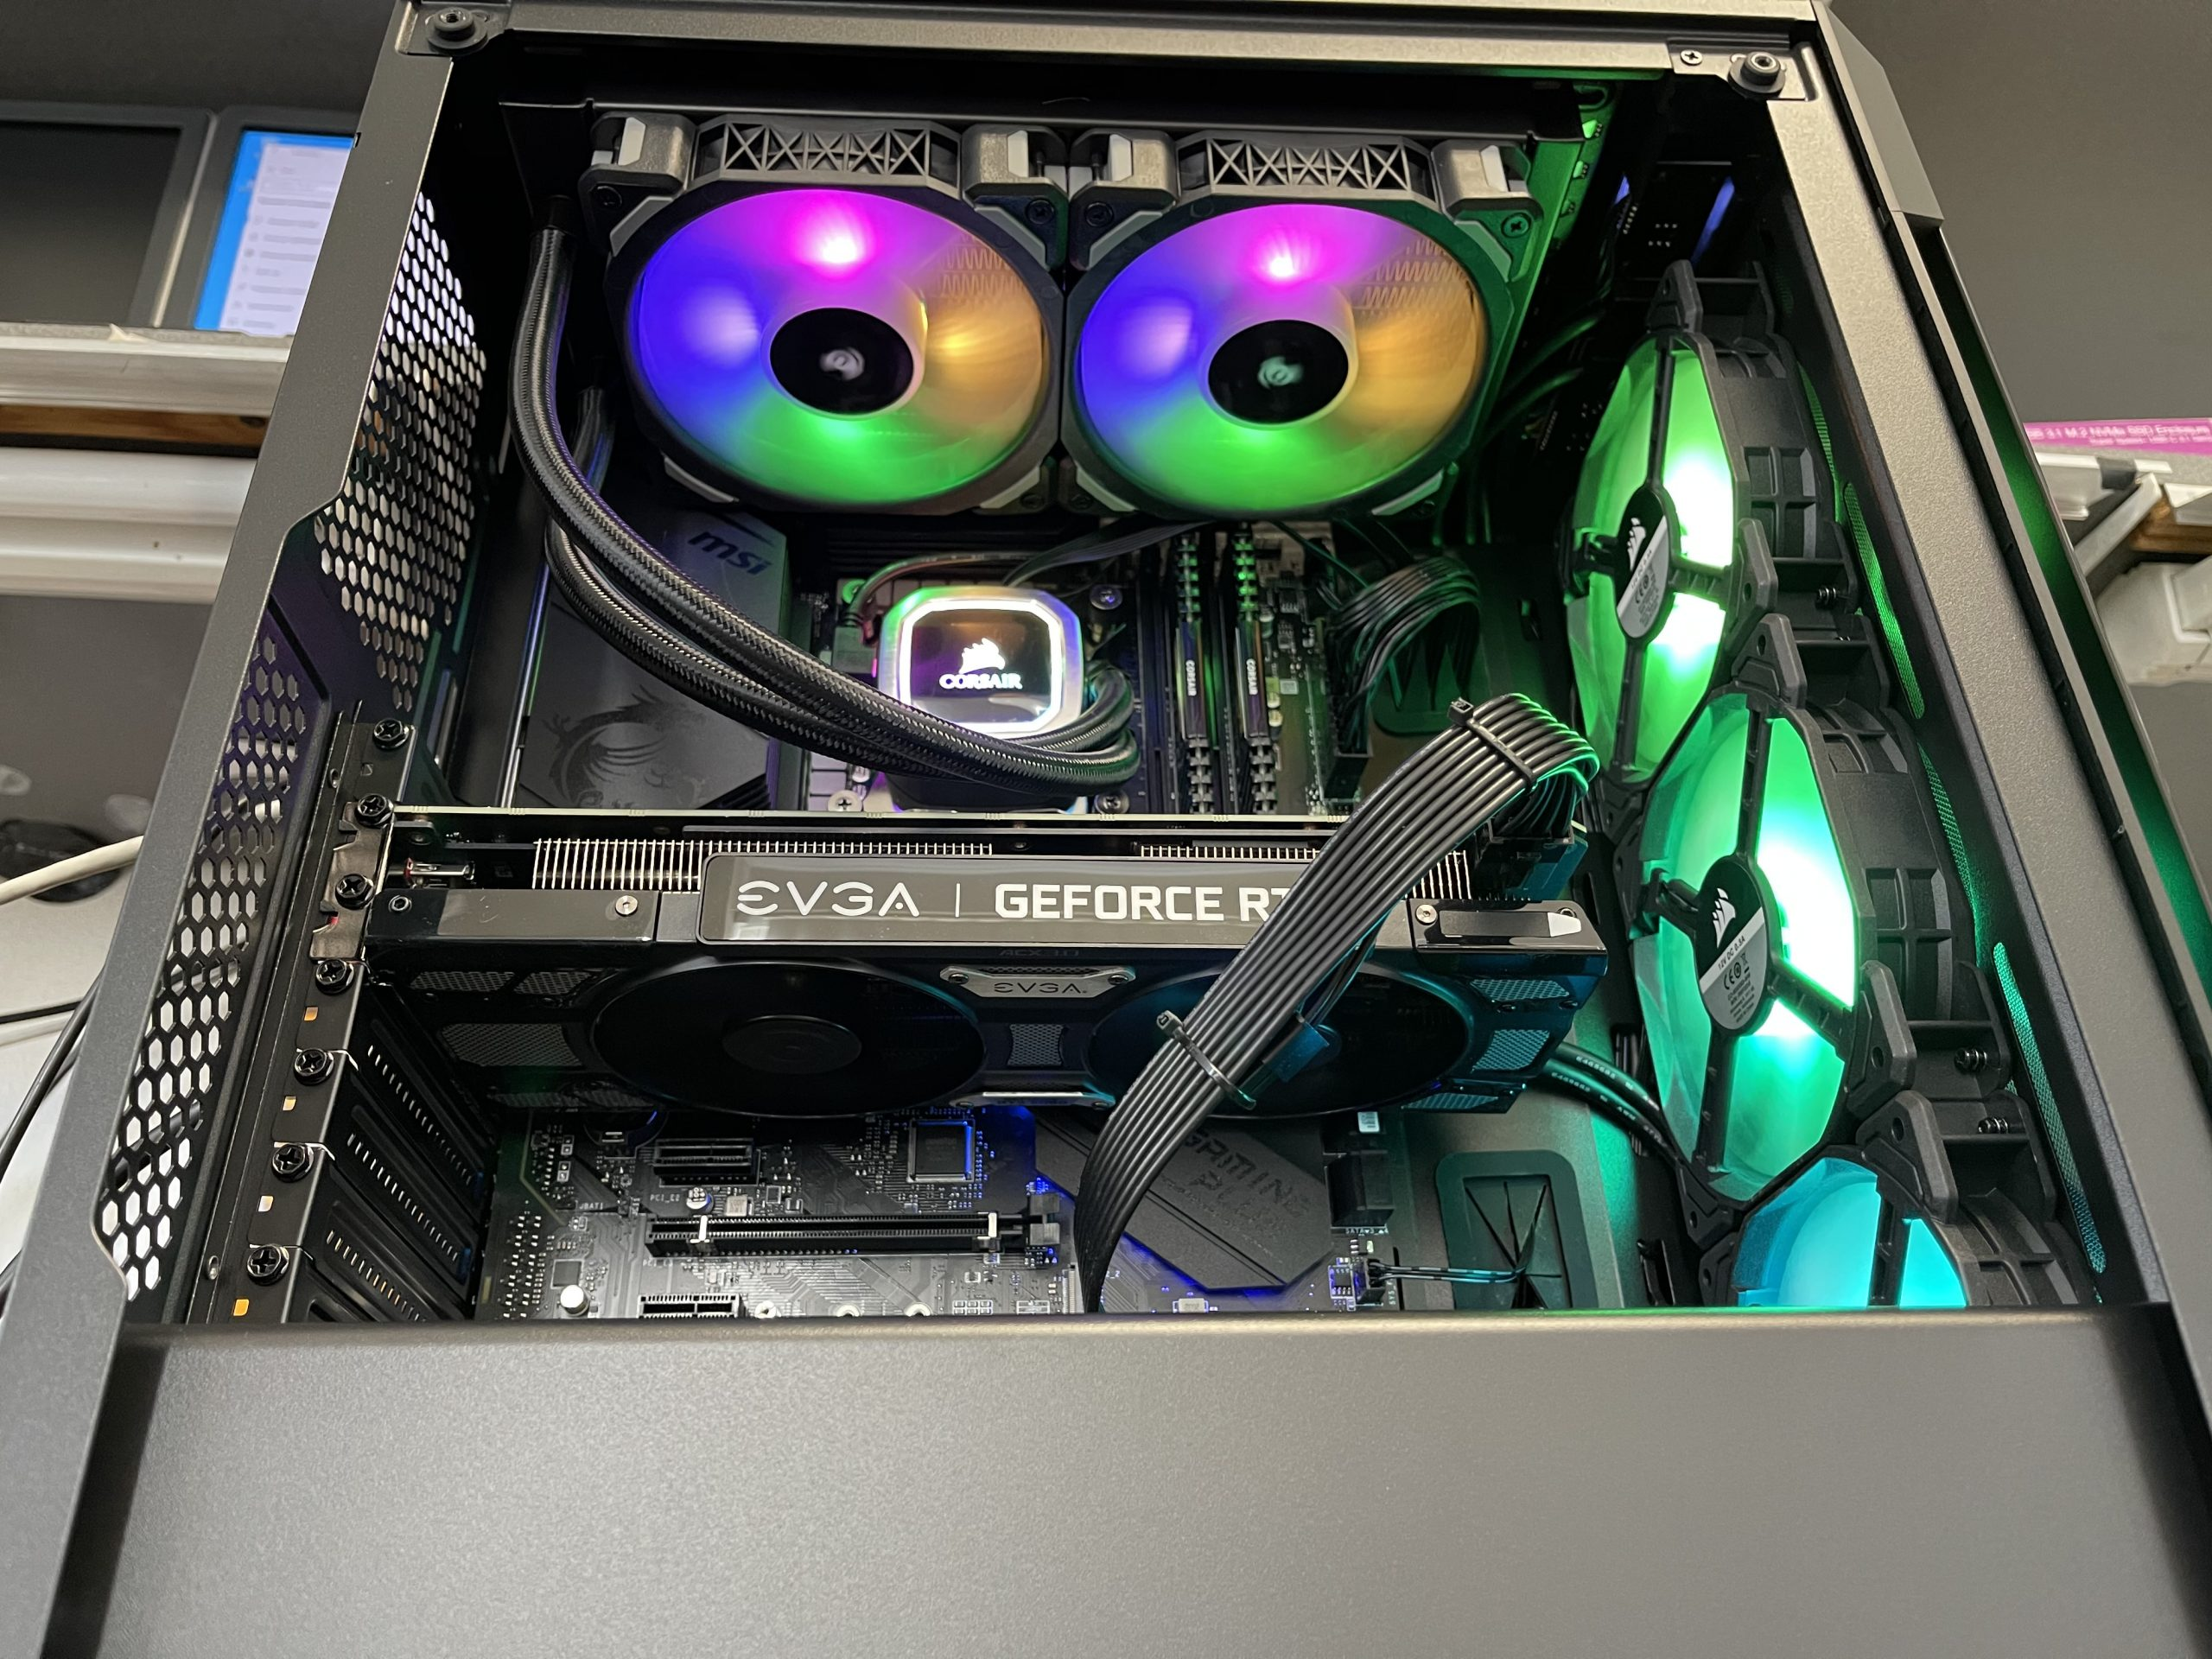 GamePC I7 10th GEN/32GB(RAM)/EVGA RTX 2060 GAMING Z 6G